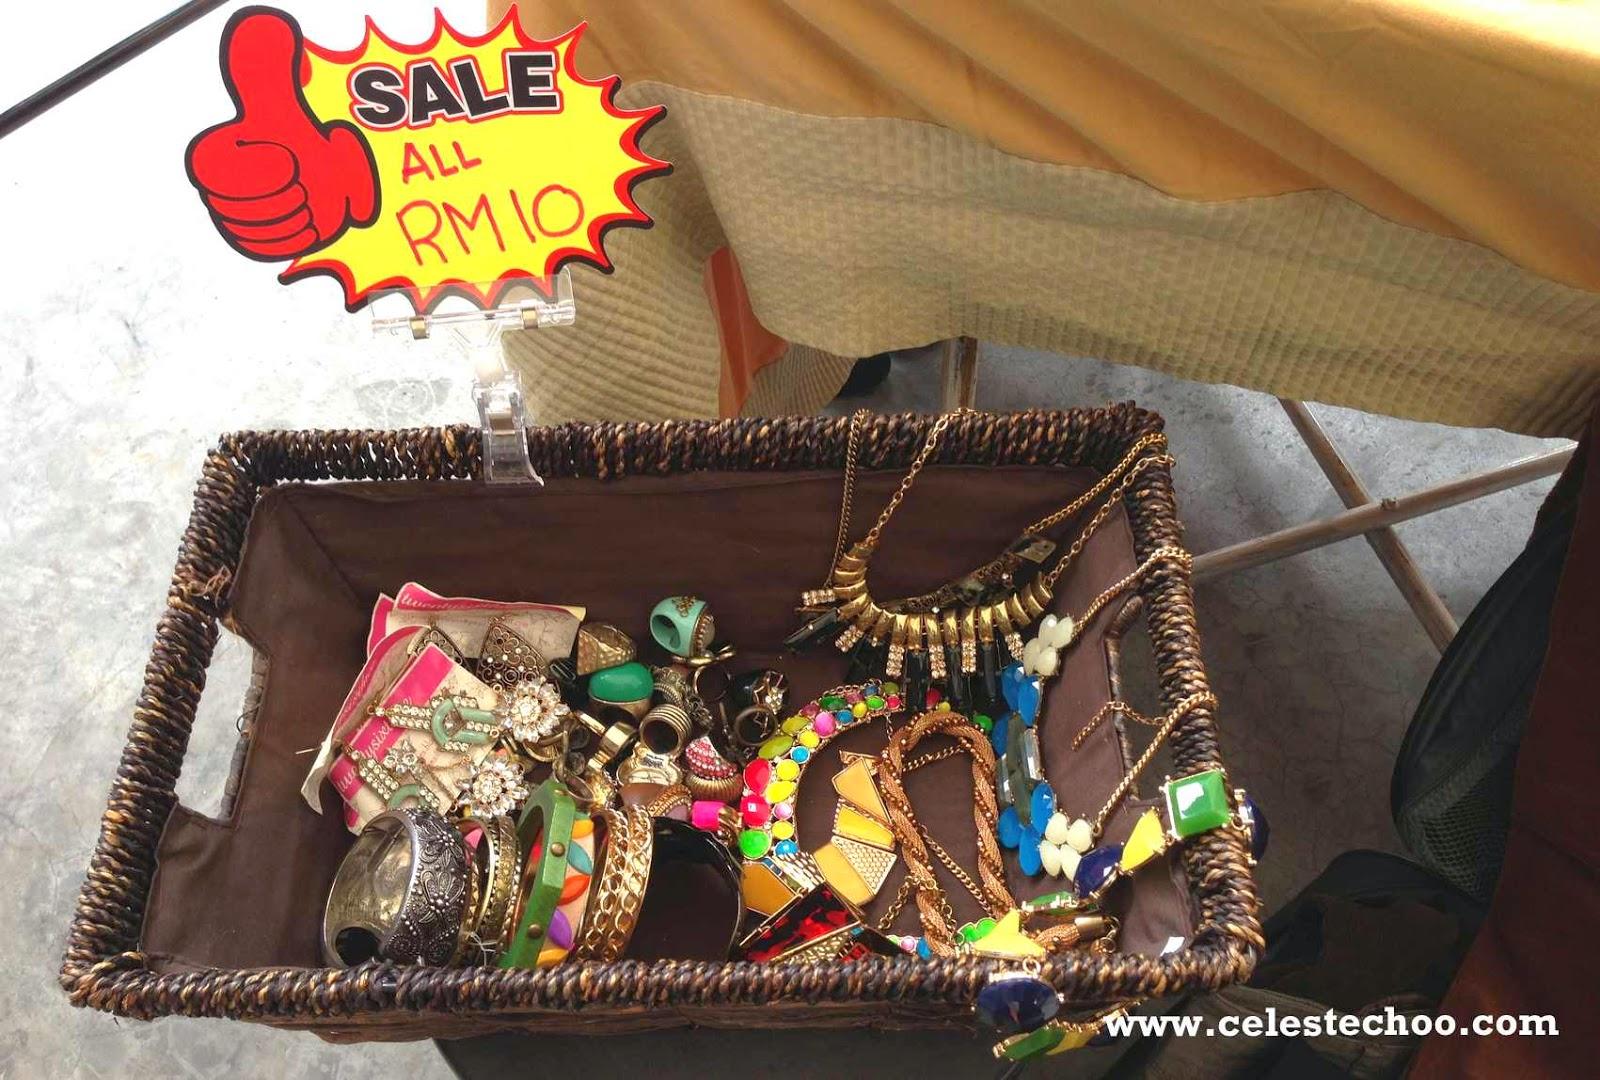 duriana_fashion_sale_shopping_event_cheap_accessories